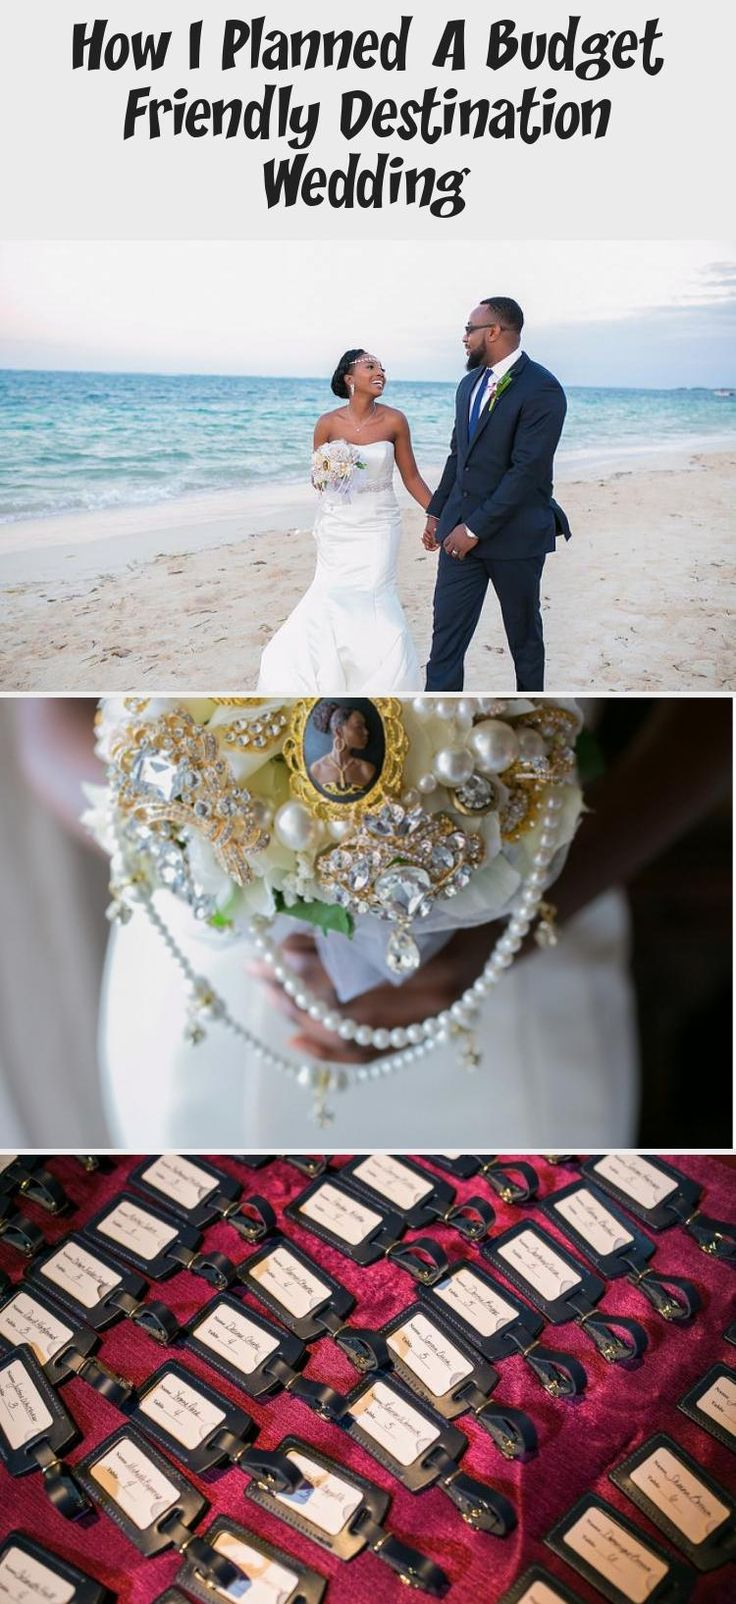 Our budget friendly destination wedding at the Iberostar